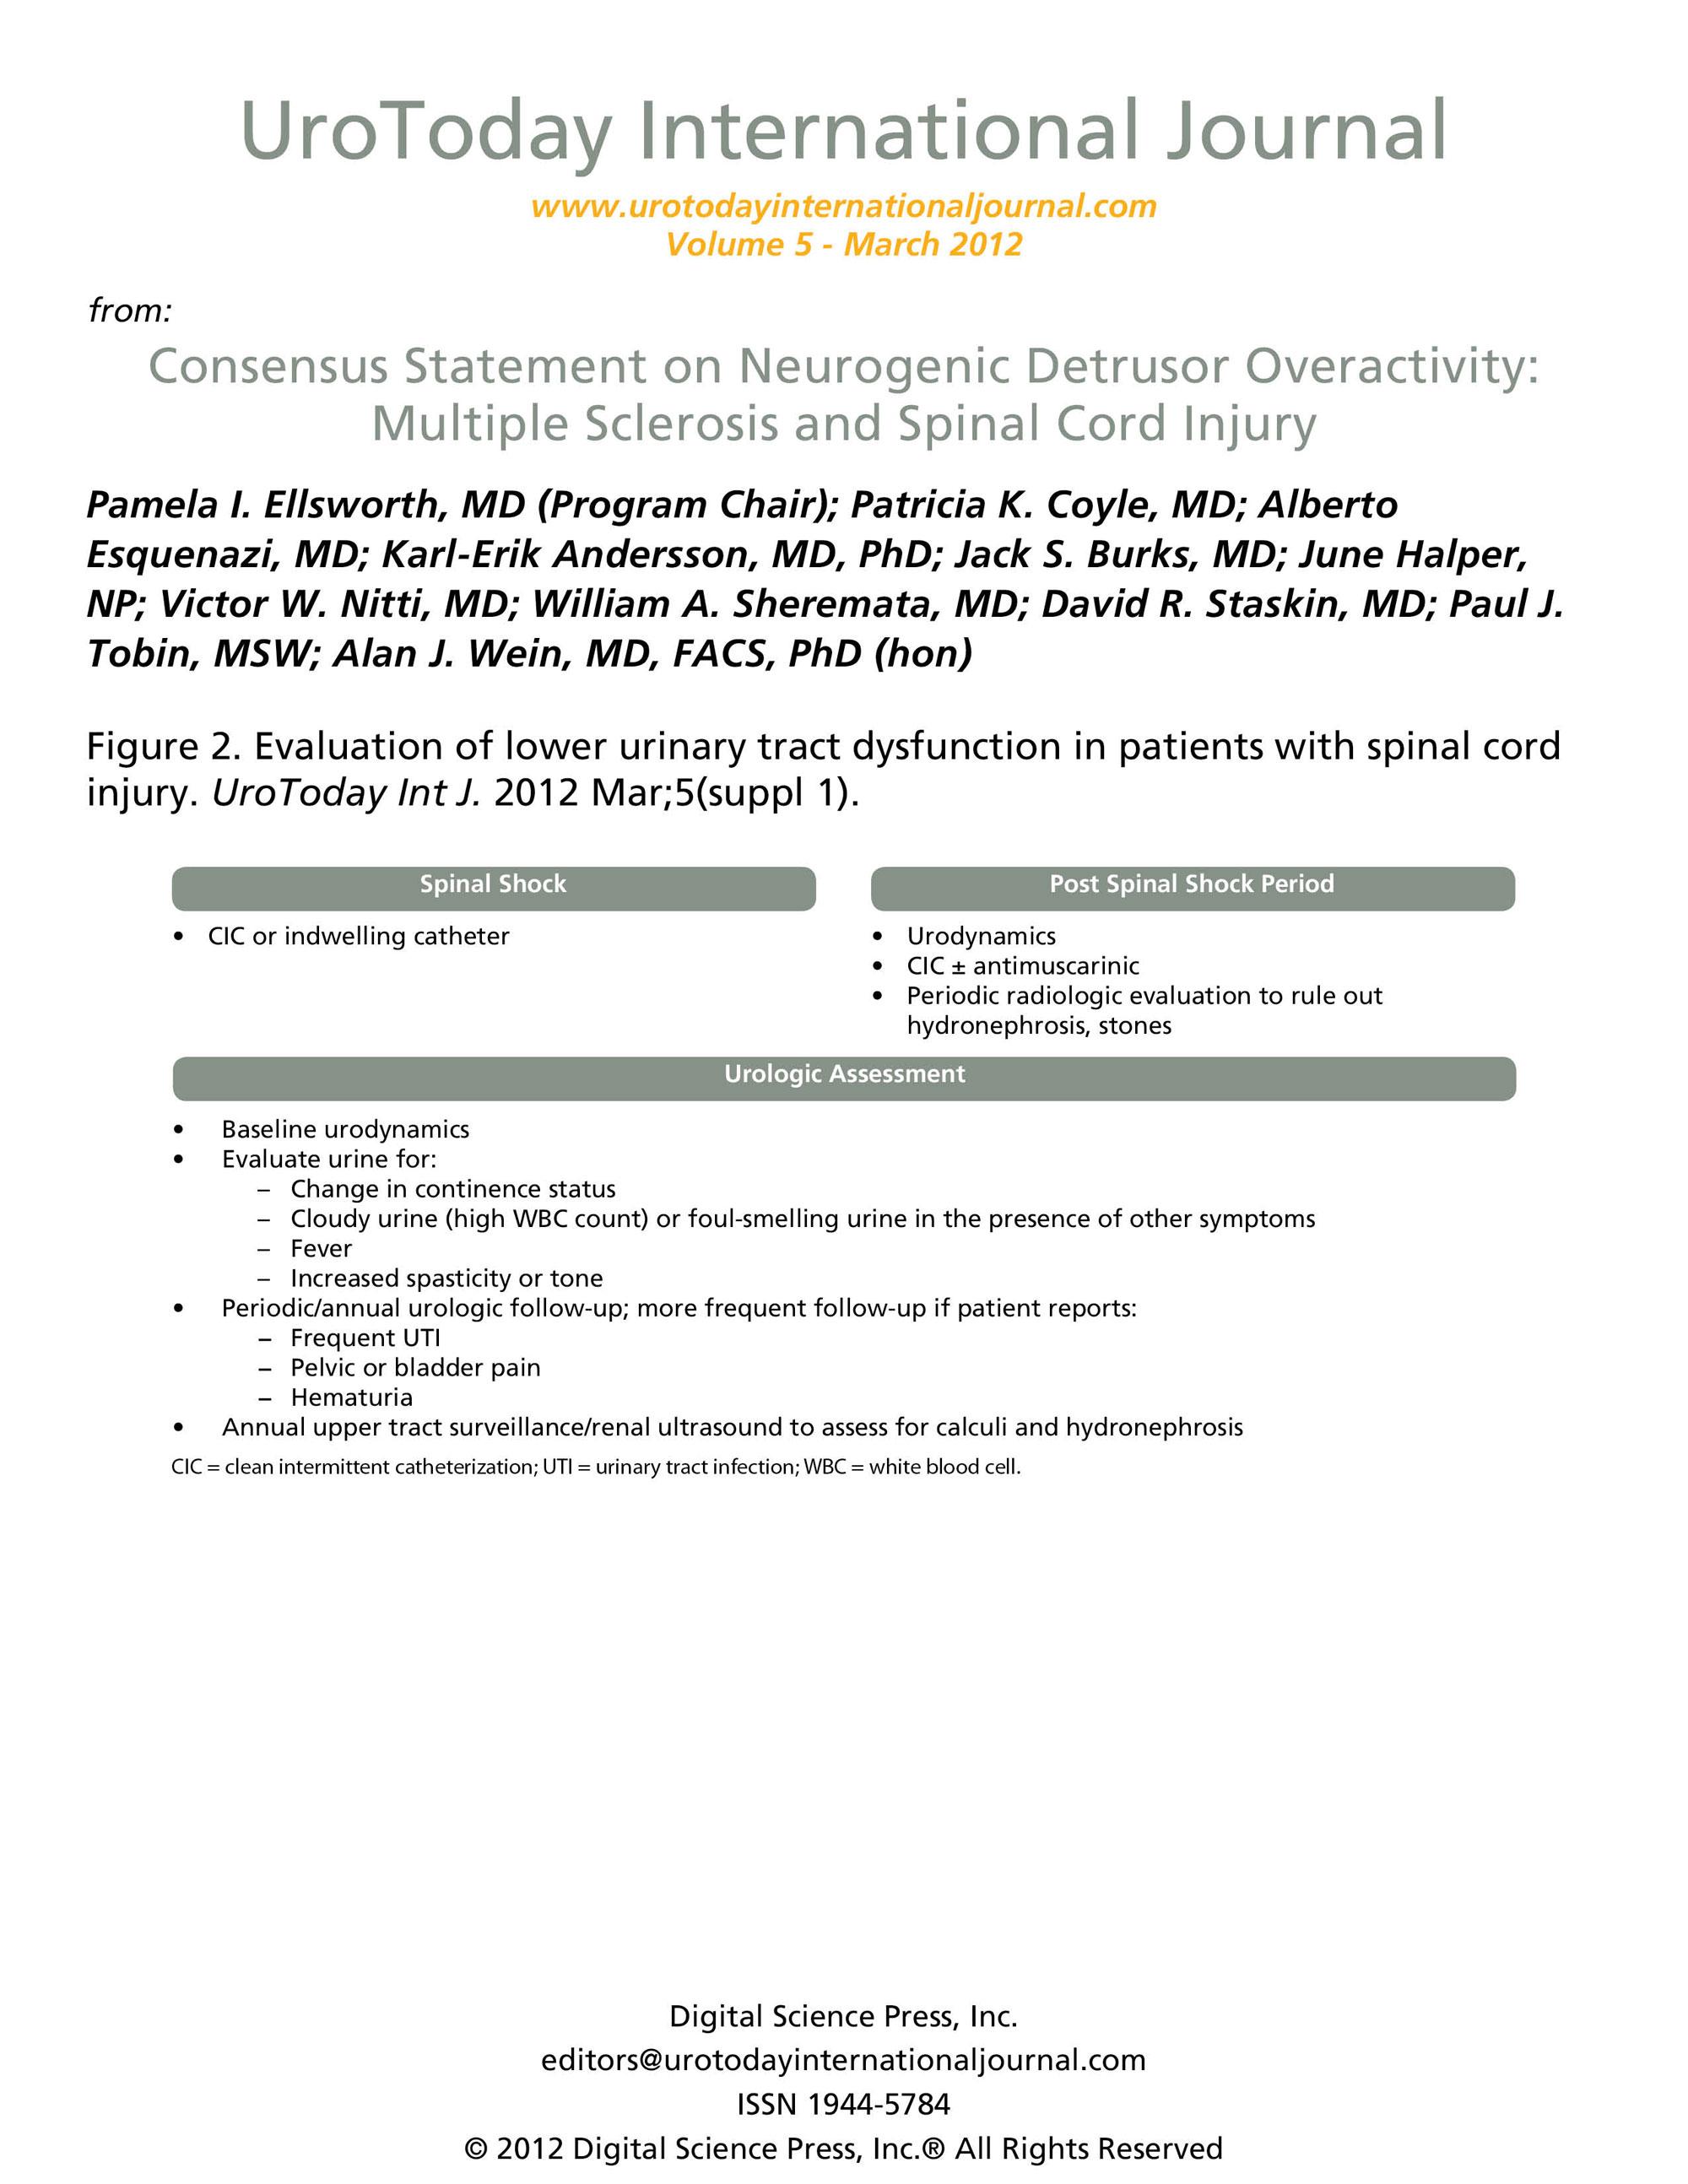 Consensus Statement on Neurogenic Detrusor Overactivity